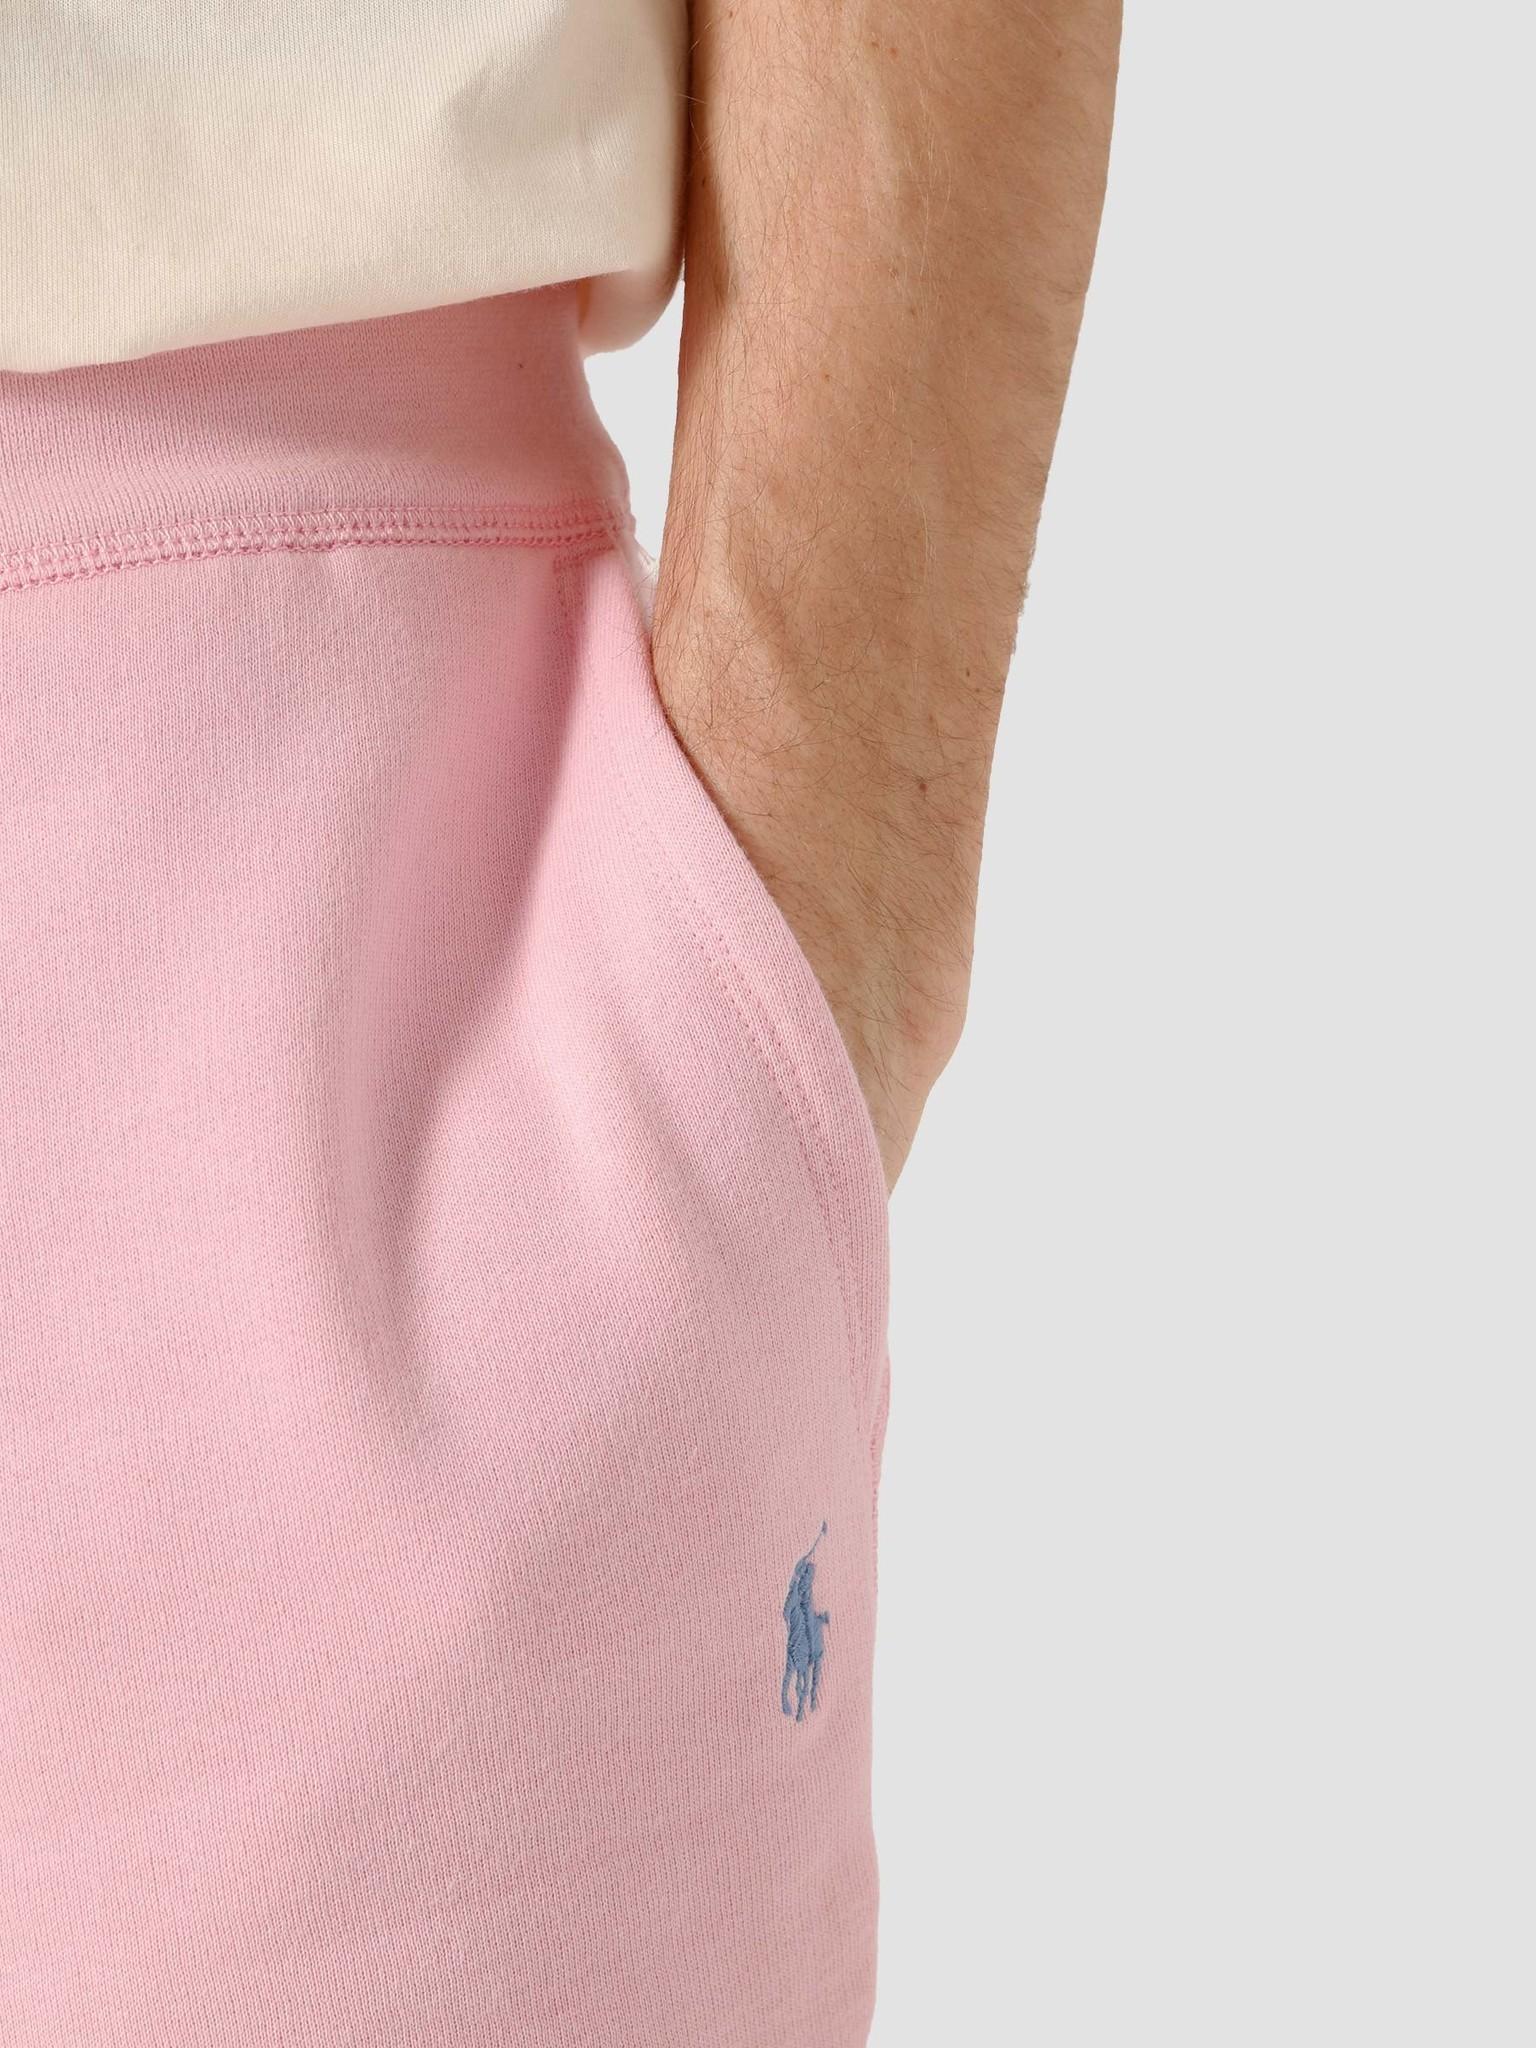 Polo Ralph Lauren Polo Ralph Lauren Athletic Short Carmel Pink 710790292013